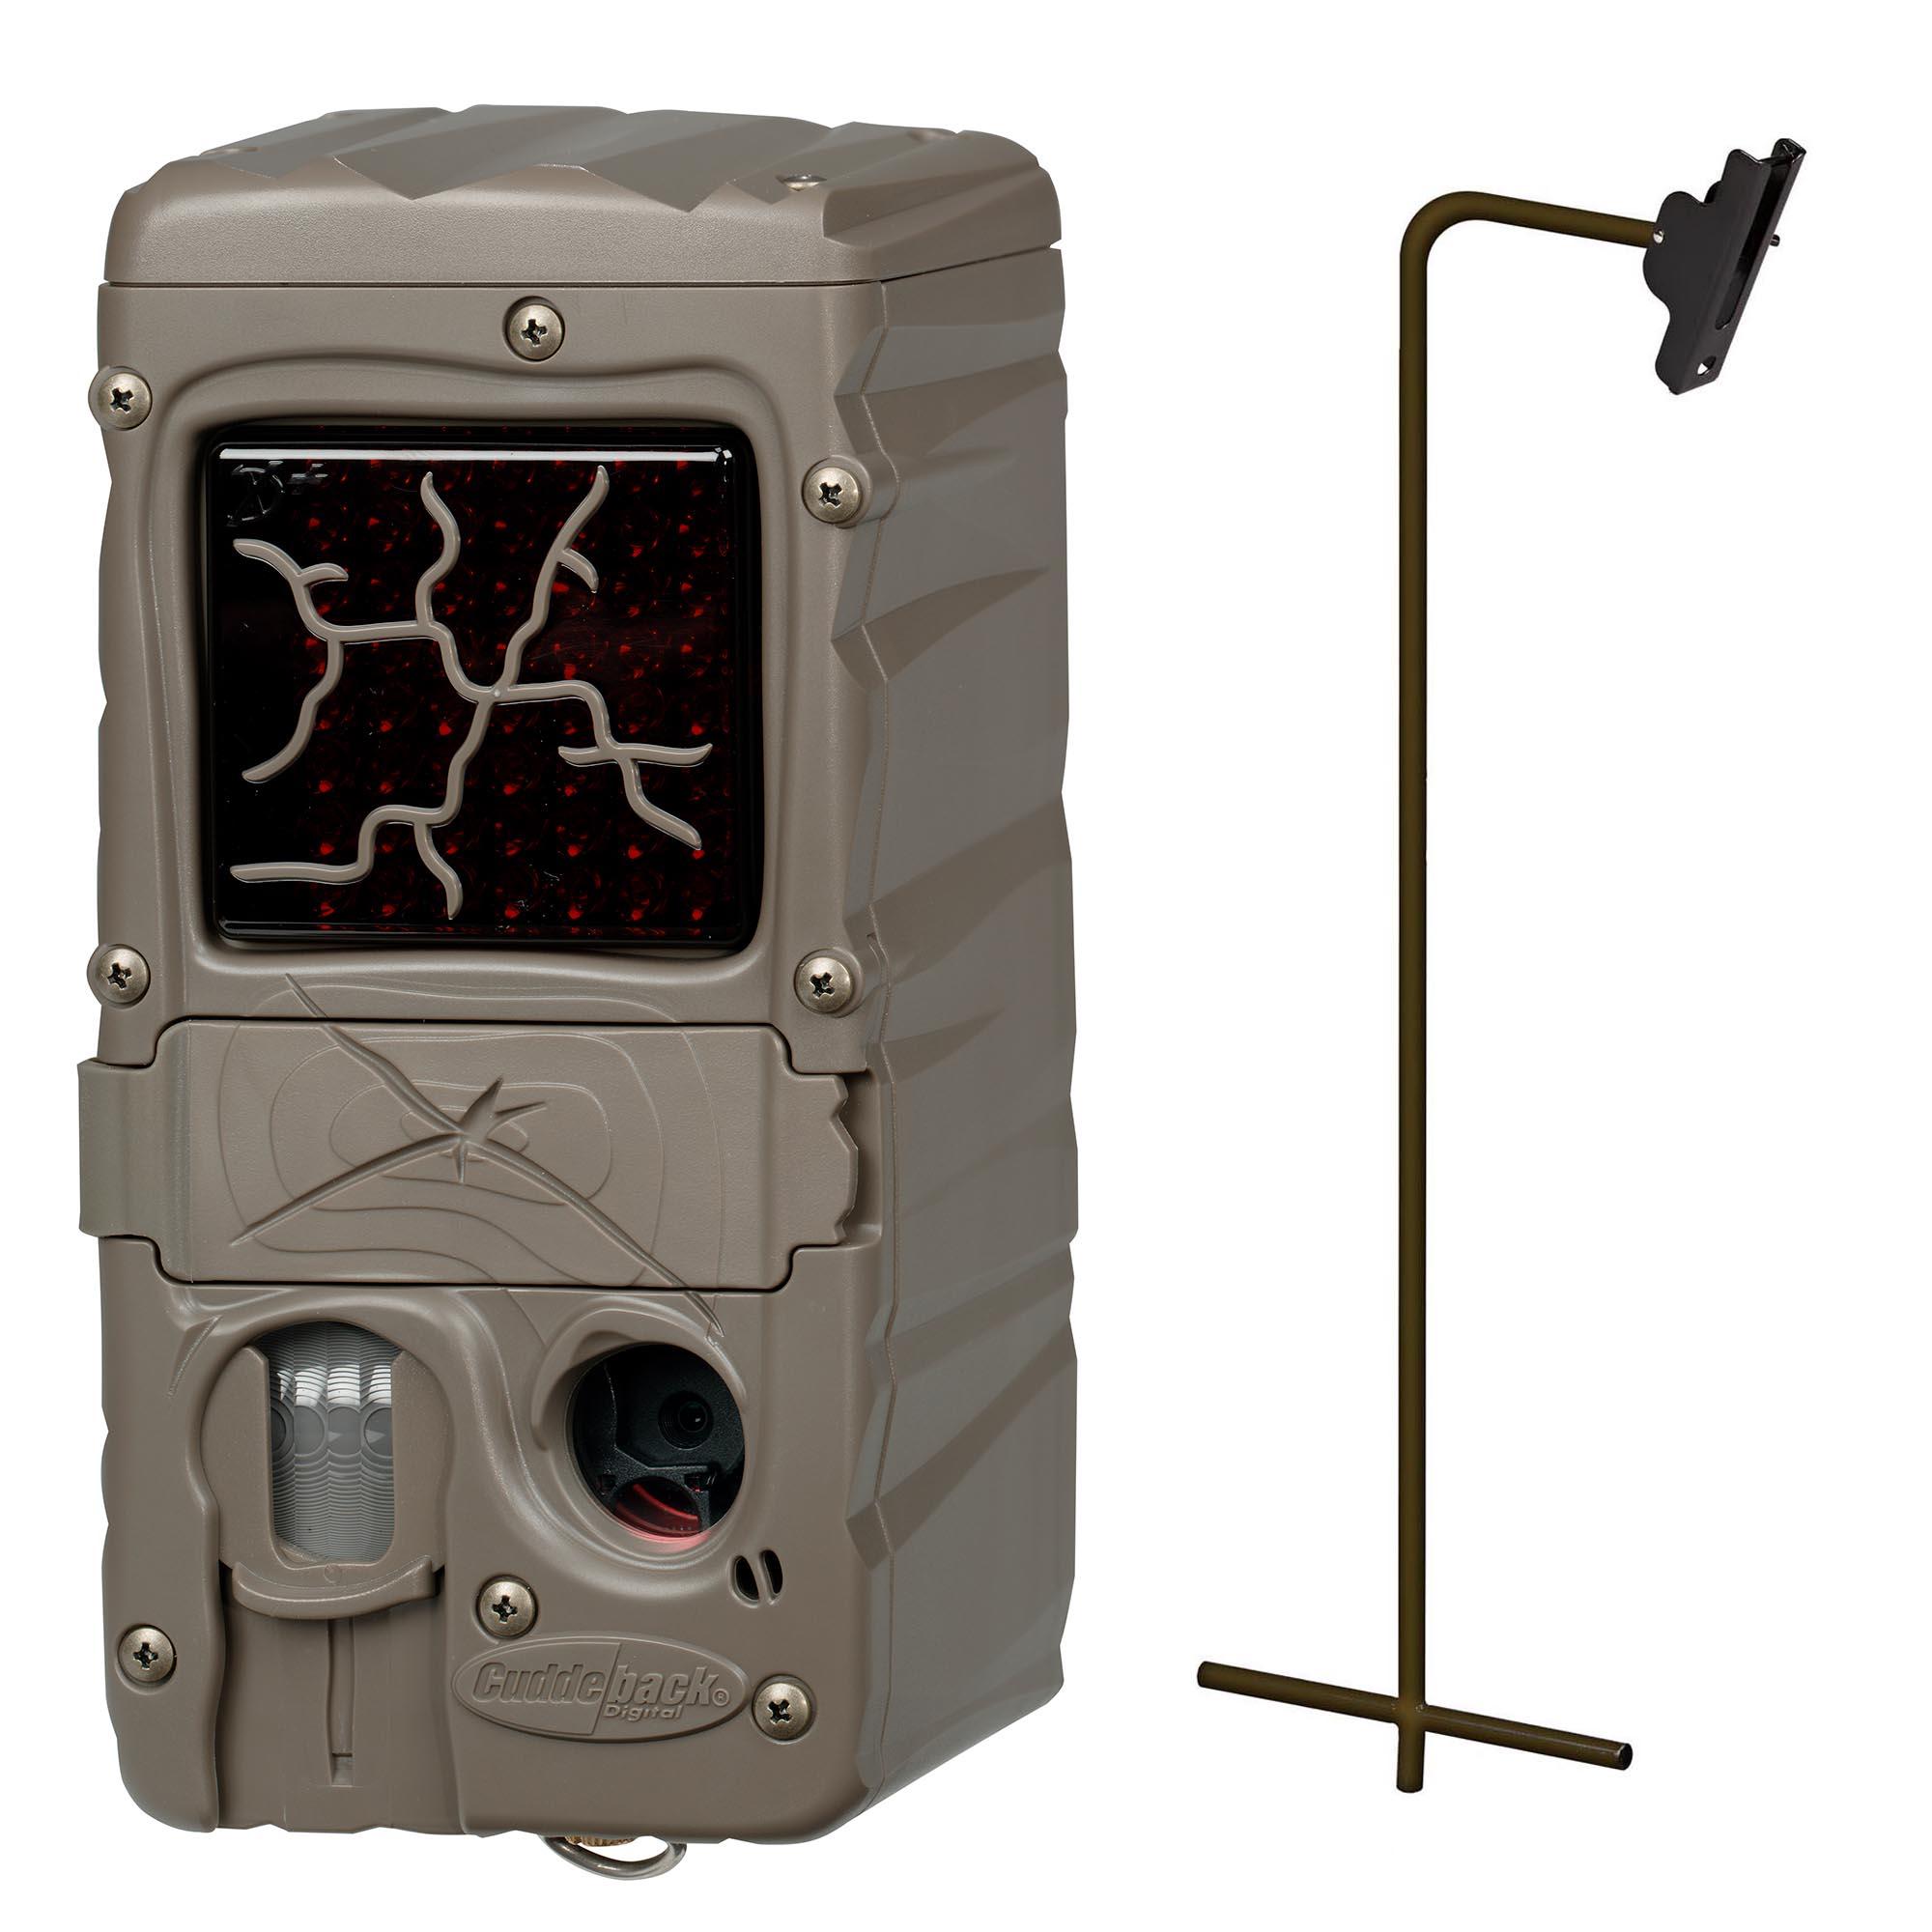 cuddeback dual flash cuddelink infrared game trail camera